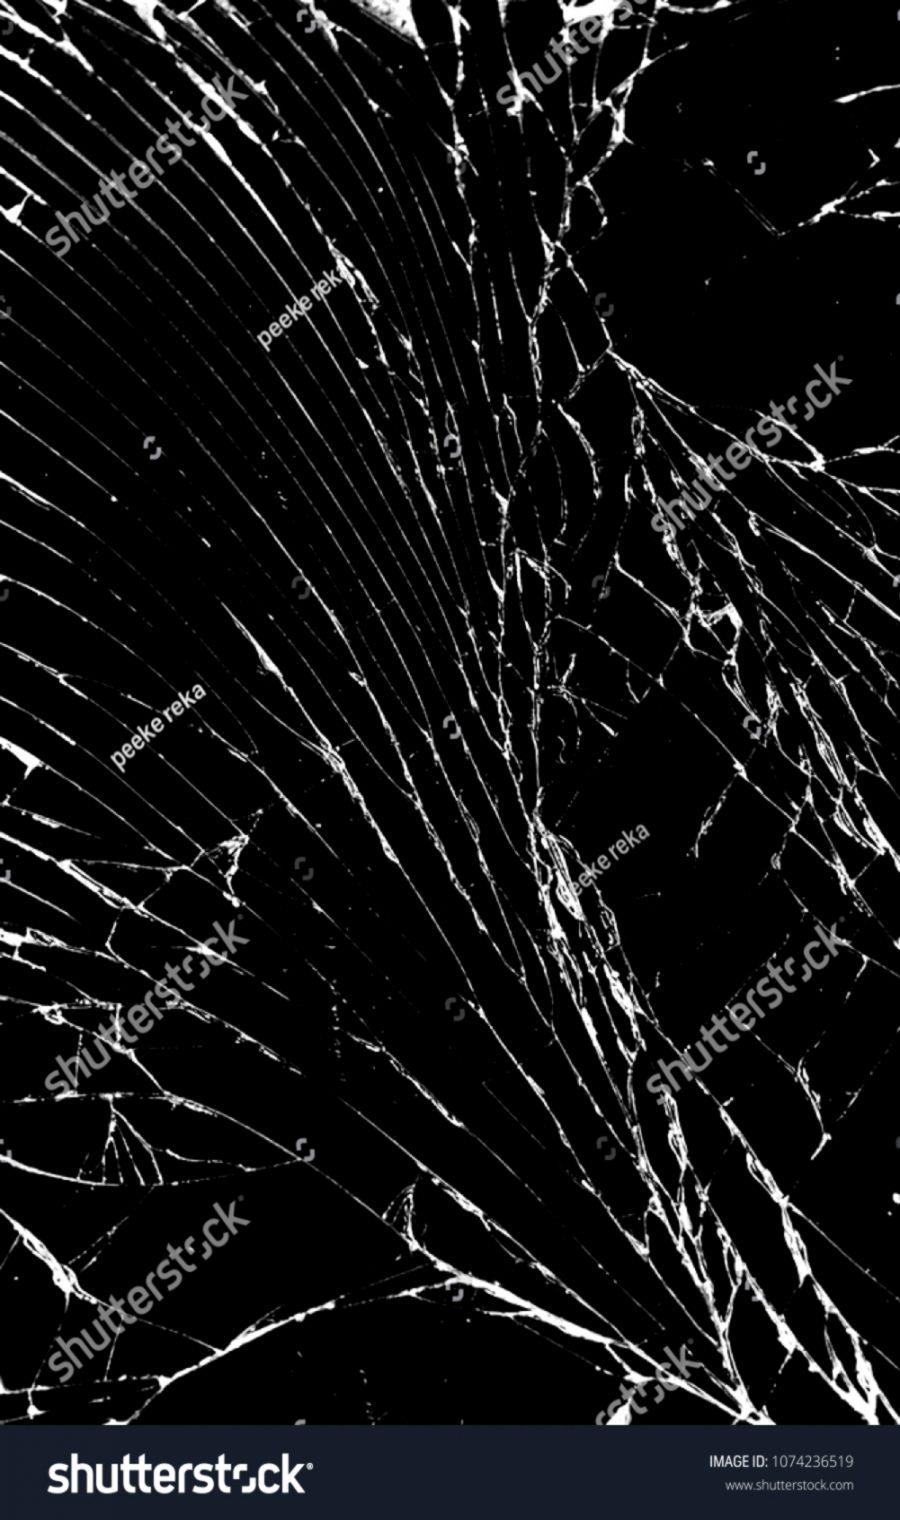 Broken Screen Wallpaper Wallpapers Sigi